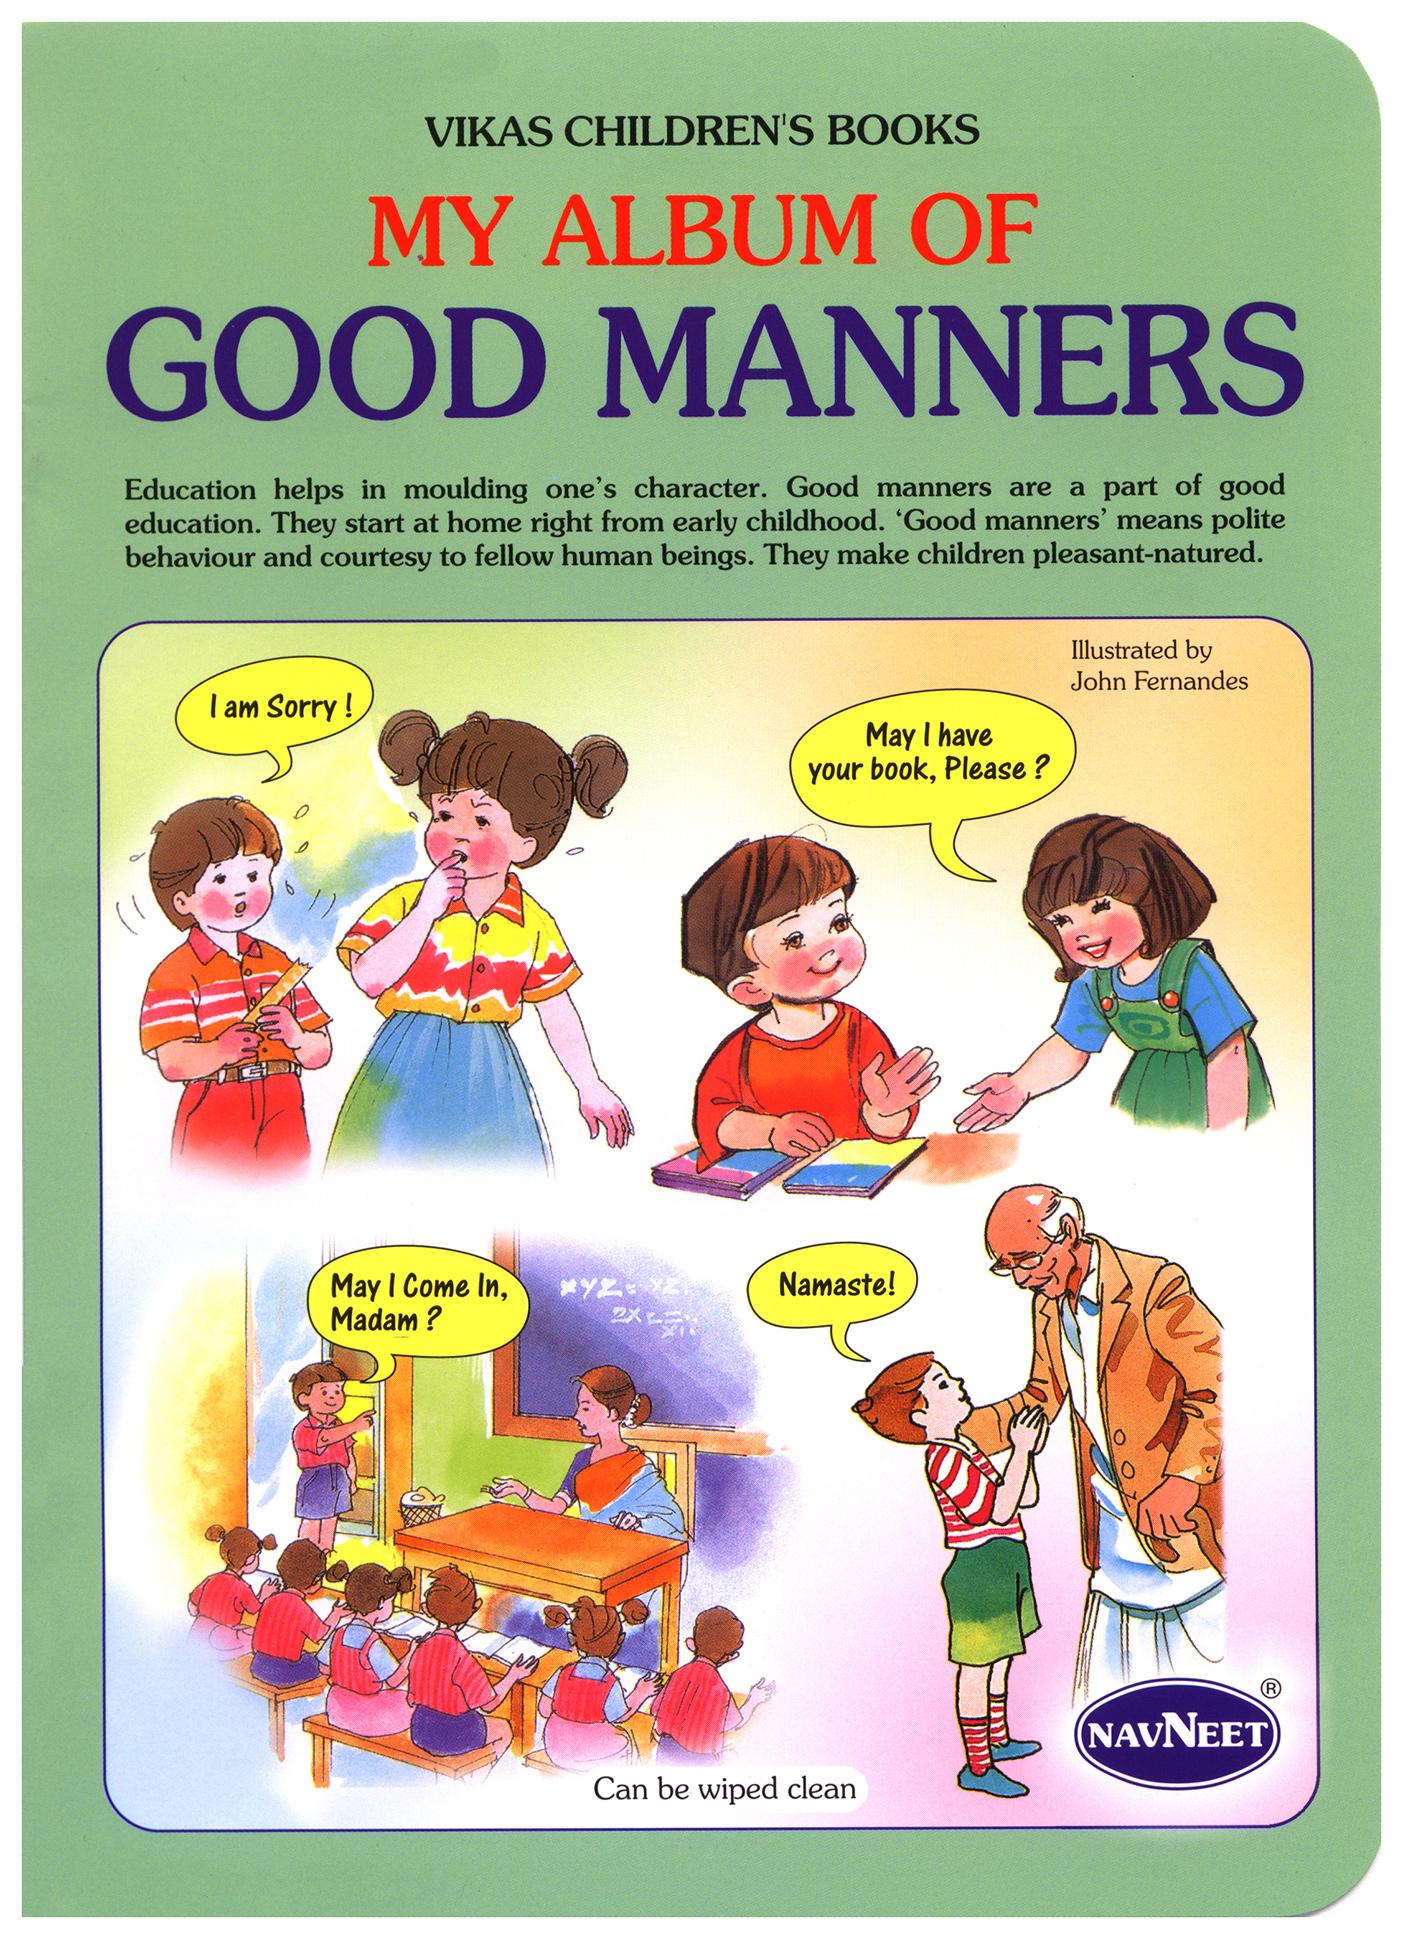 007 Basic Table Manners Essay On Good For Child Wonderful Full